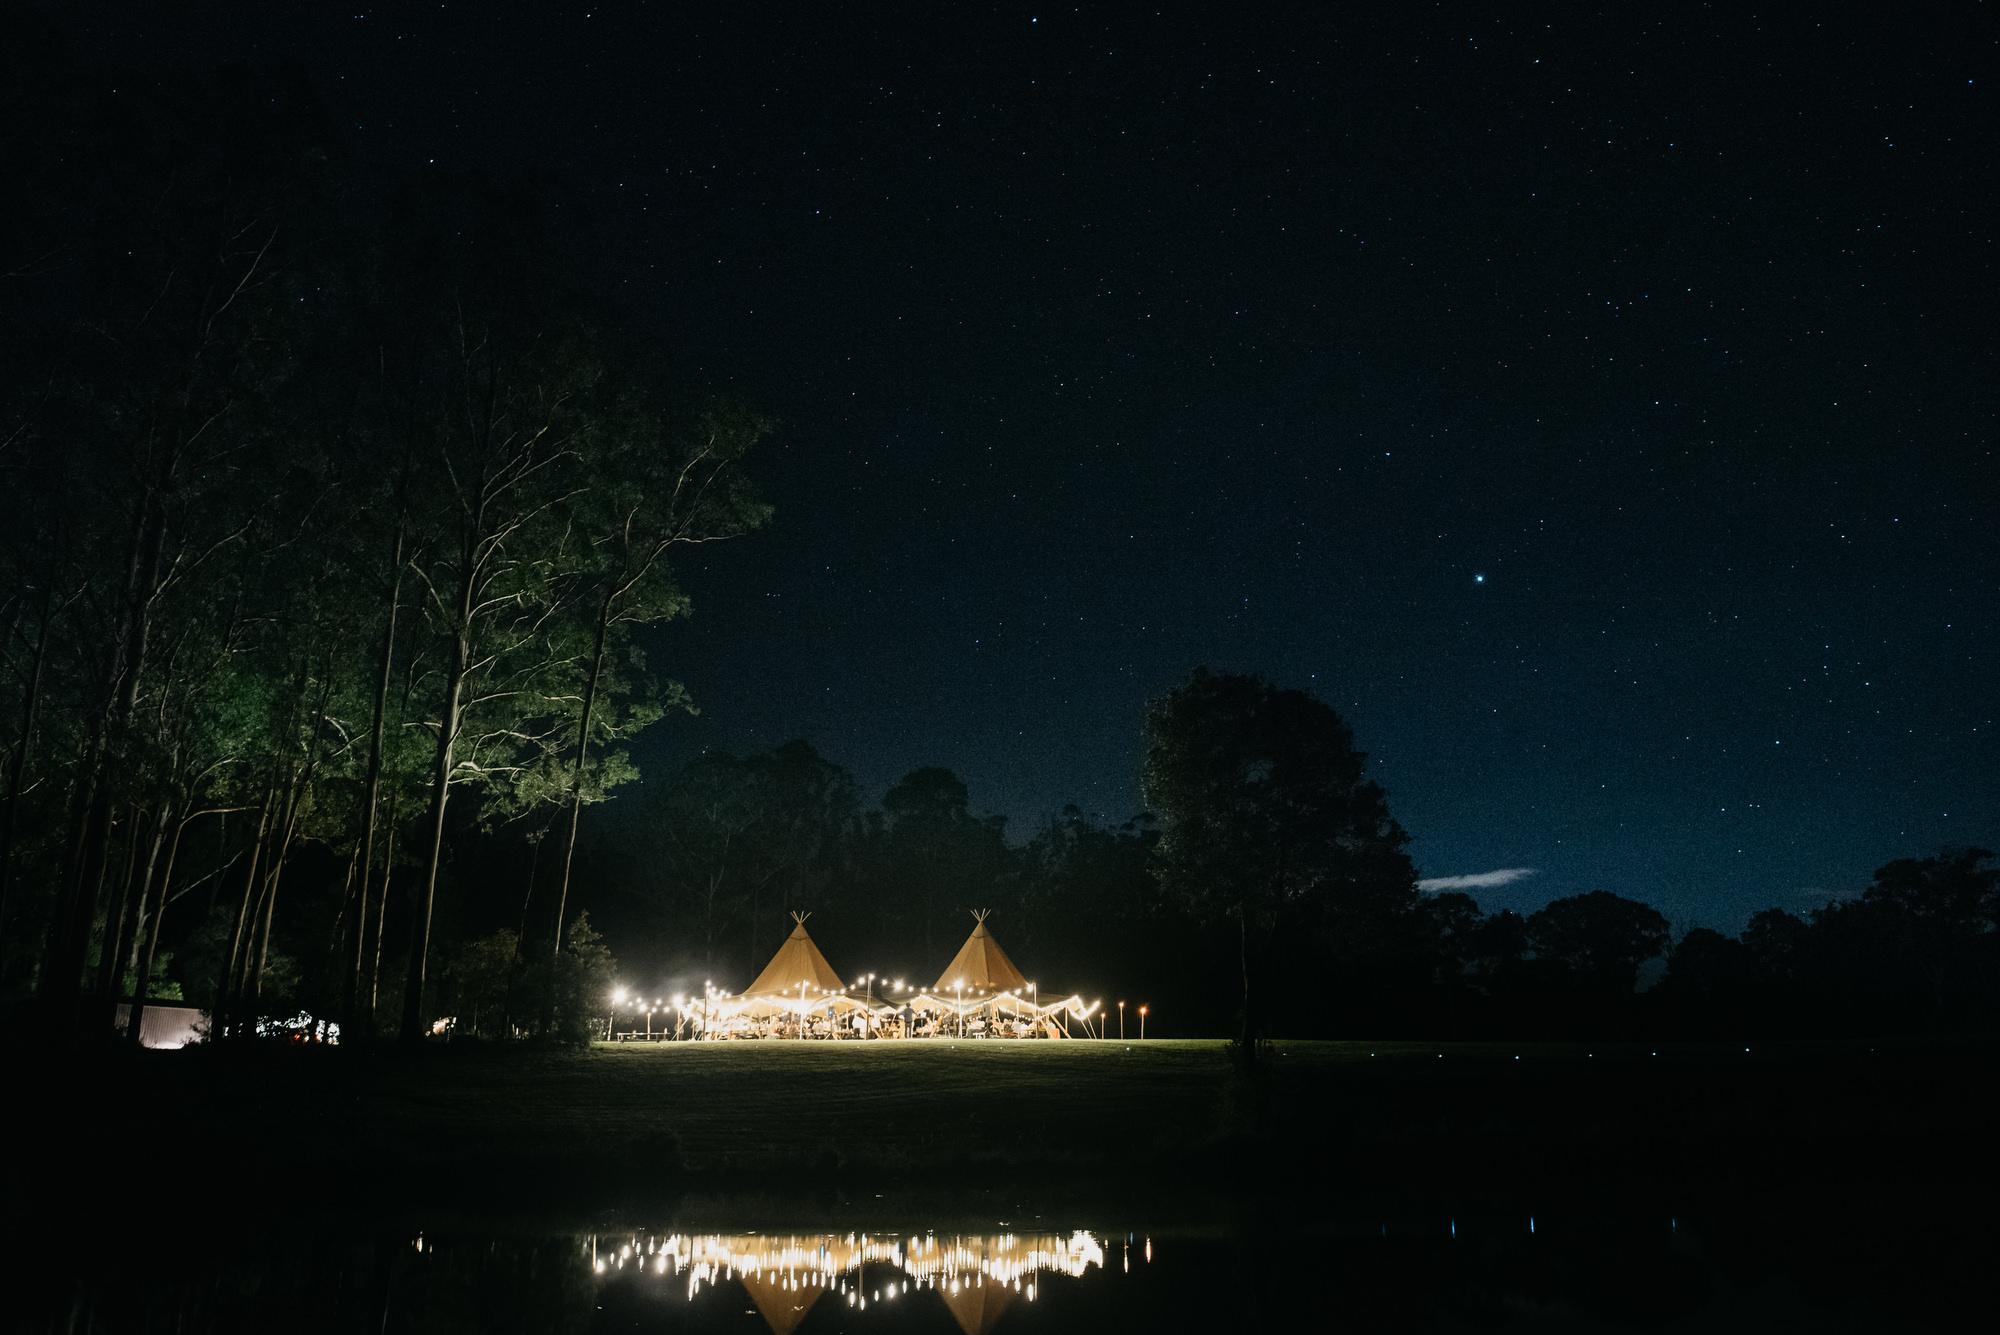 EPHEMERAL CREATIVE Falls Farm wedding Sunshine Coast with Tipi and festoon lighting